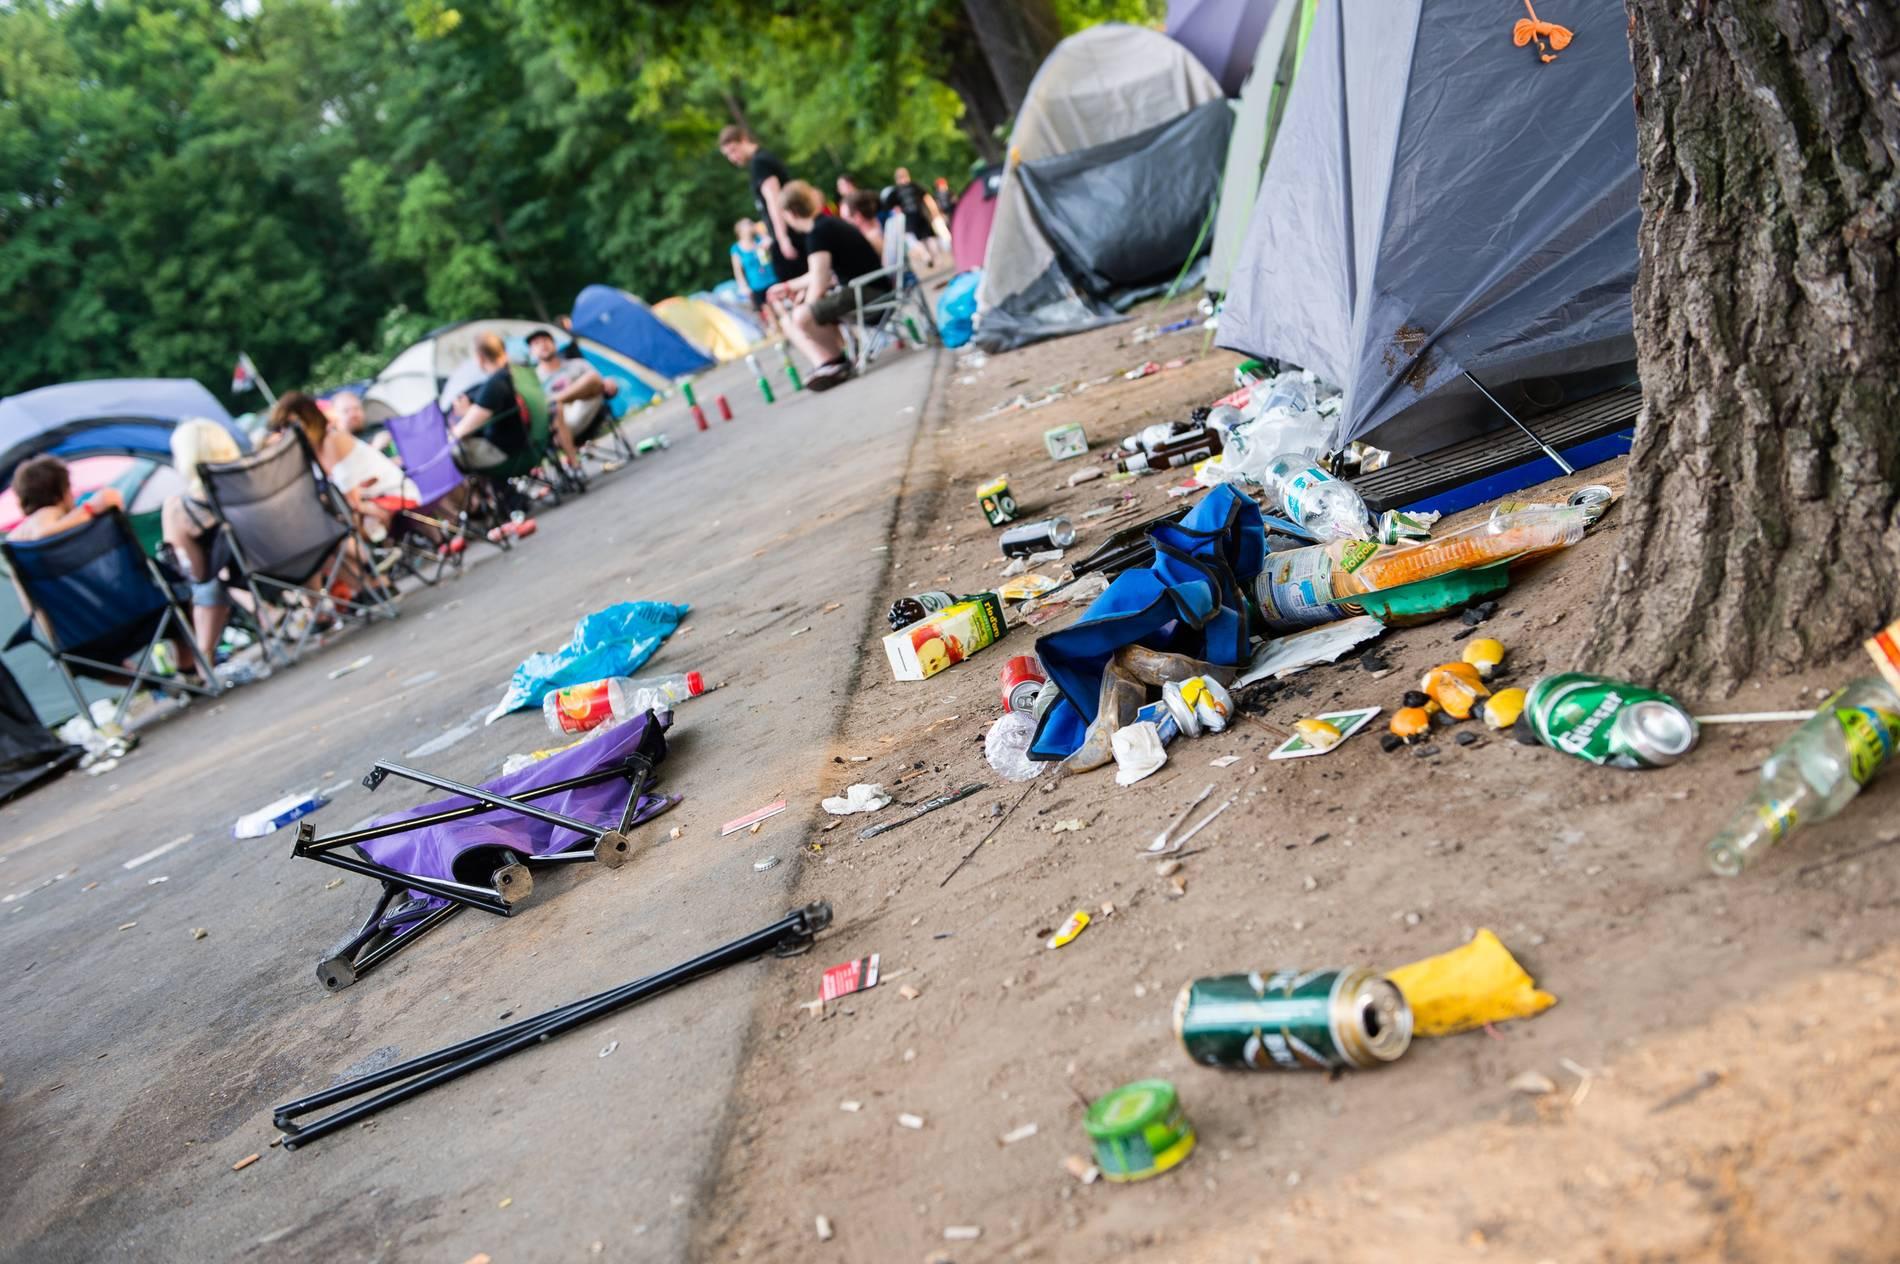 Rock Am Ring 2019 Müllproblem Auf Dem Festivalgelände